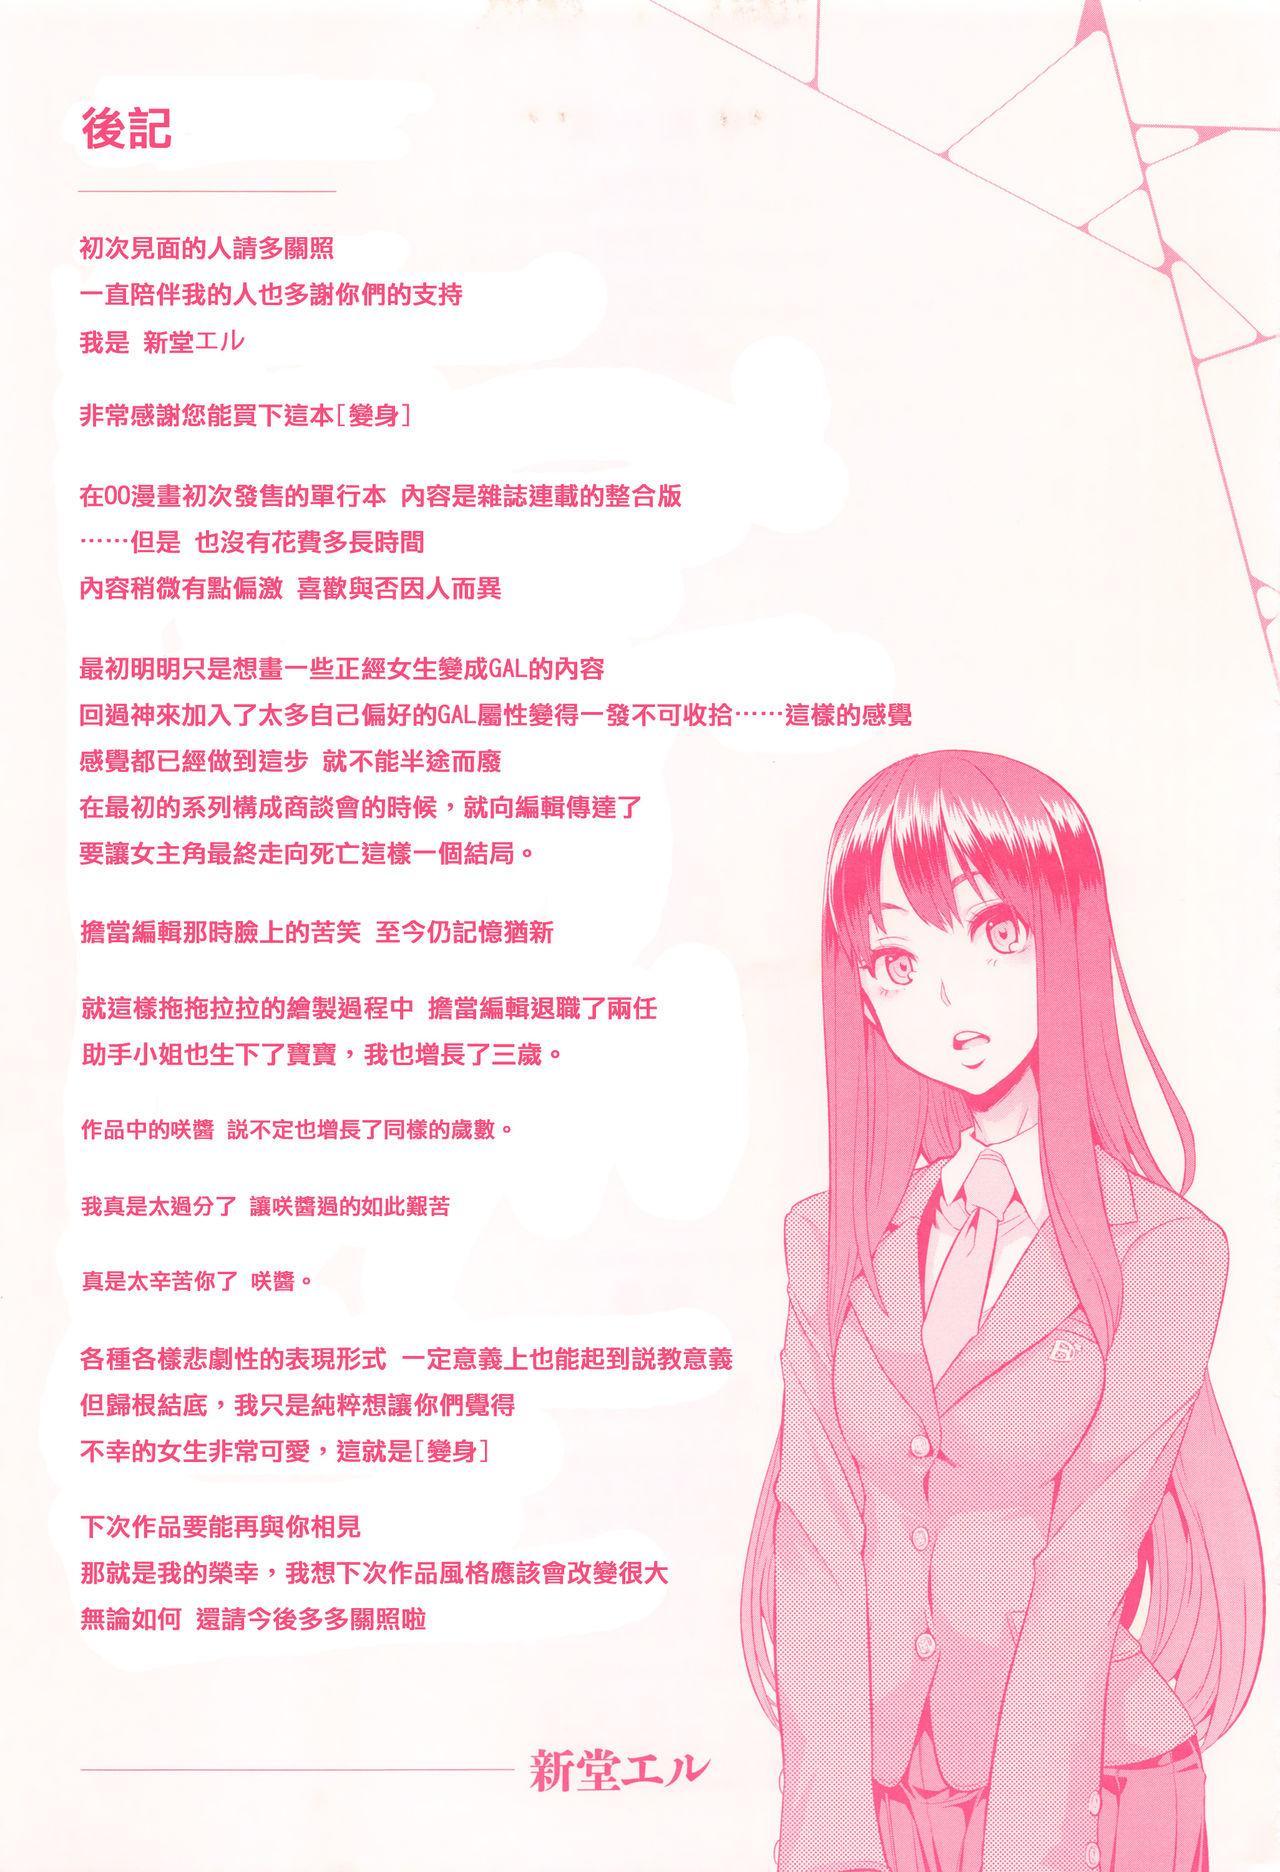 Henshin + 4P leaflet 246